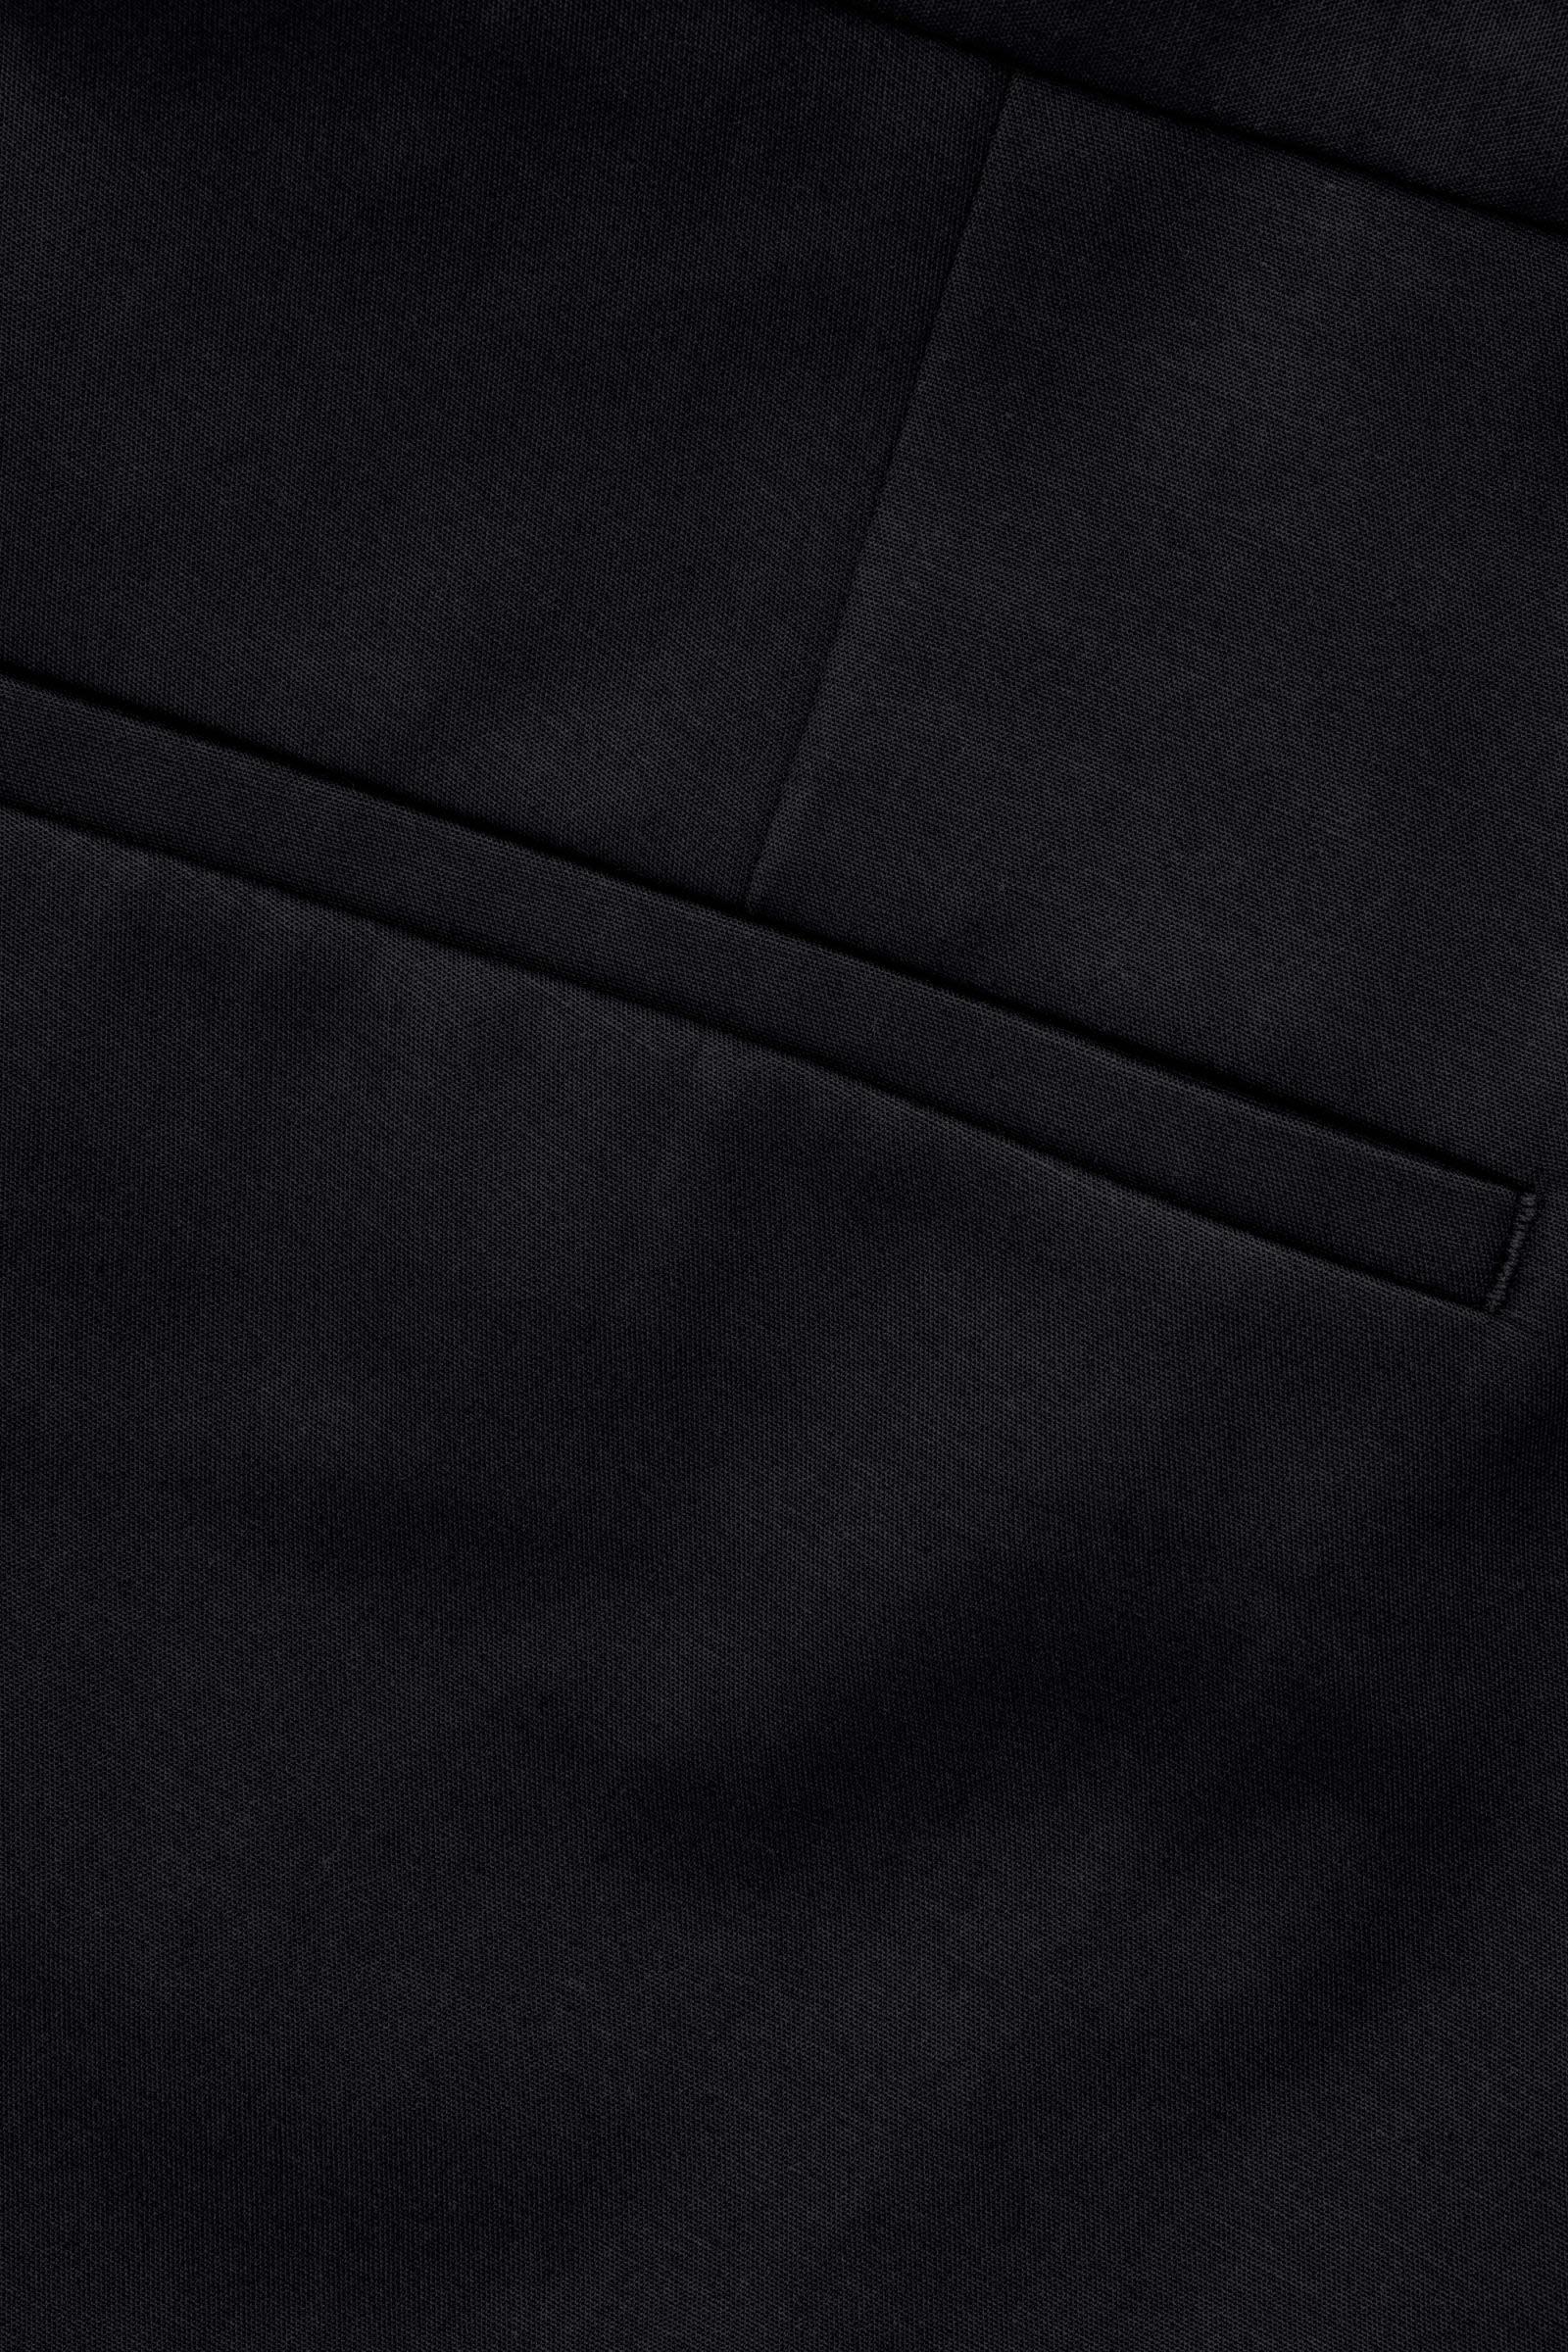 COS 스키니 스트레치 코튼 트라우저의 블랙컬러 Detail입니다.